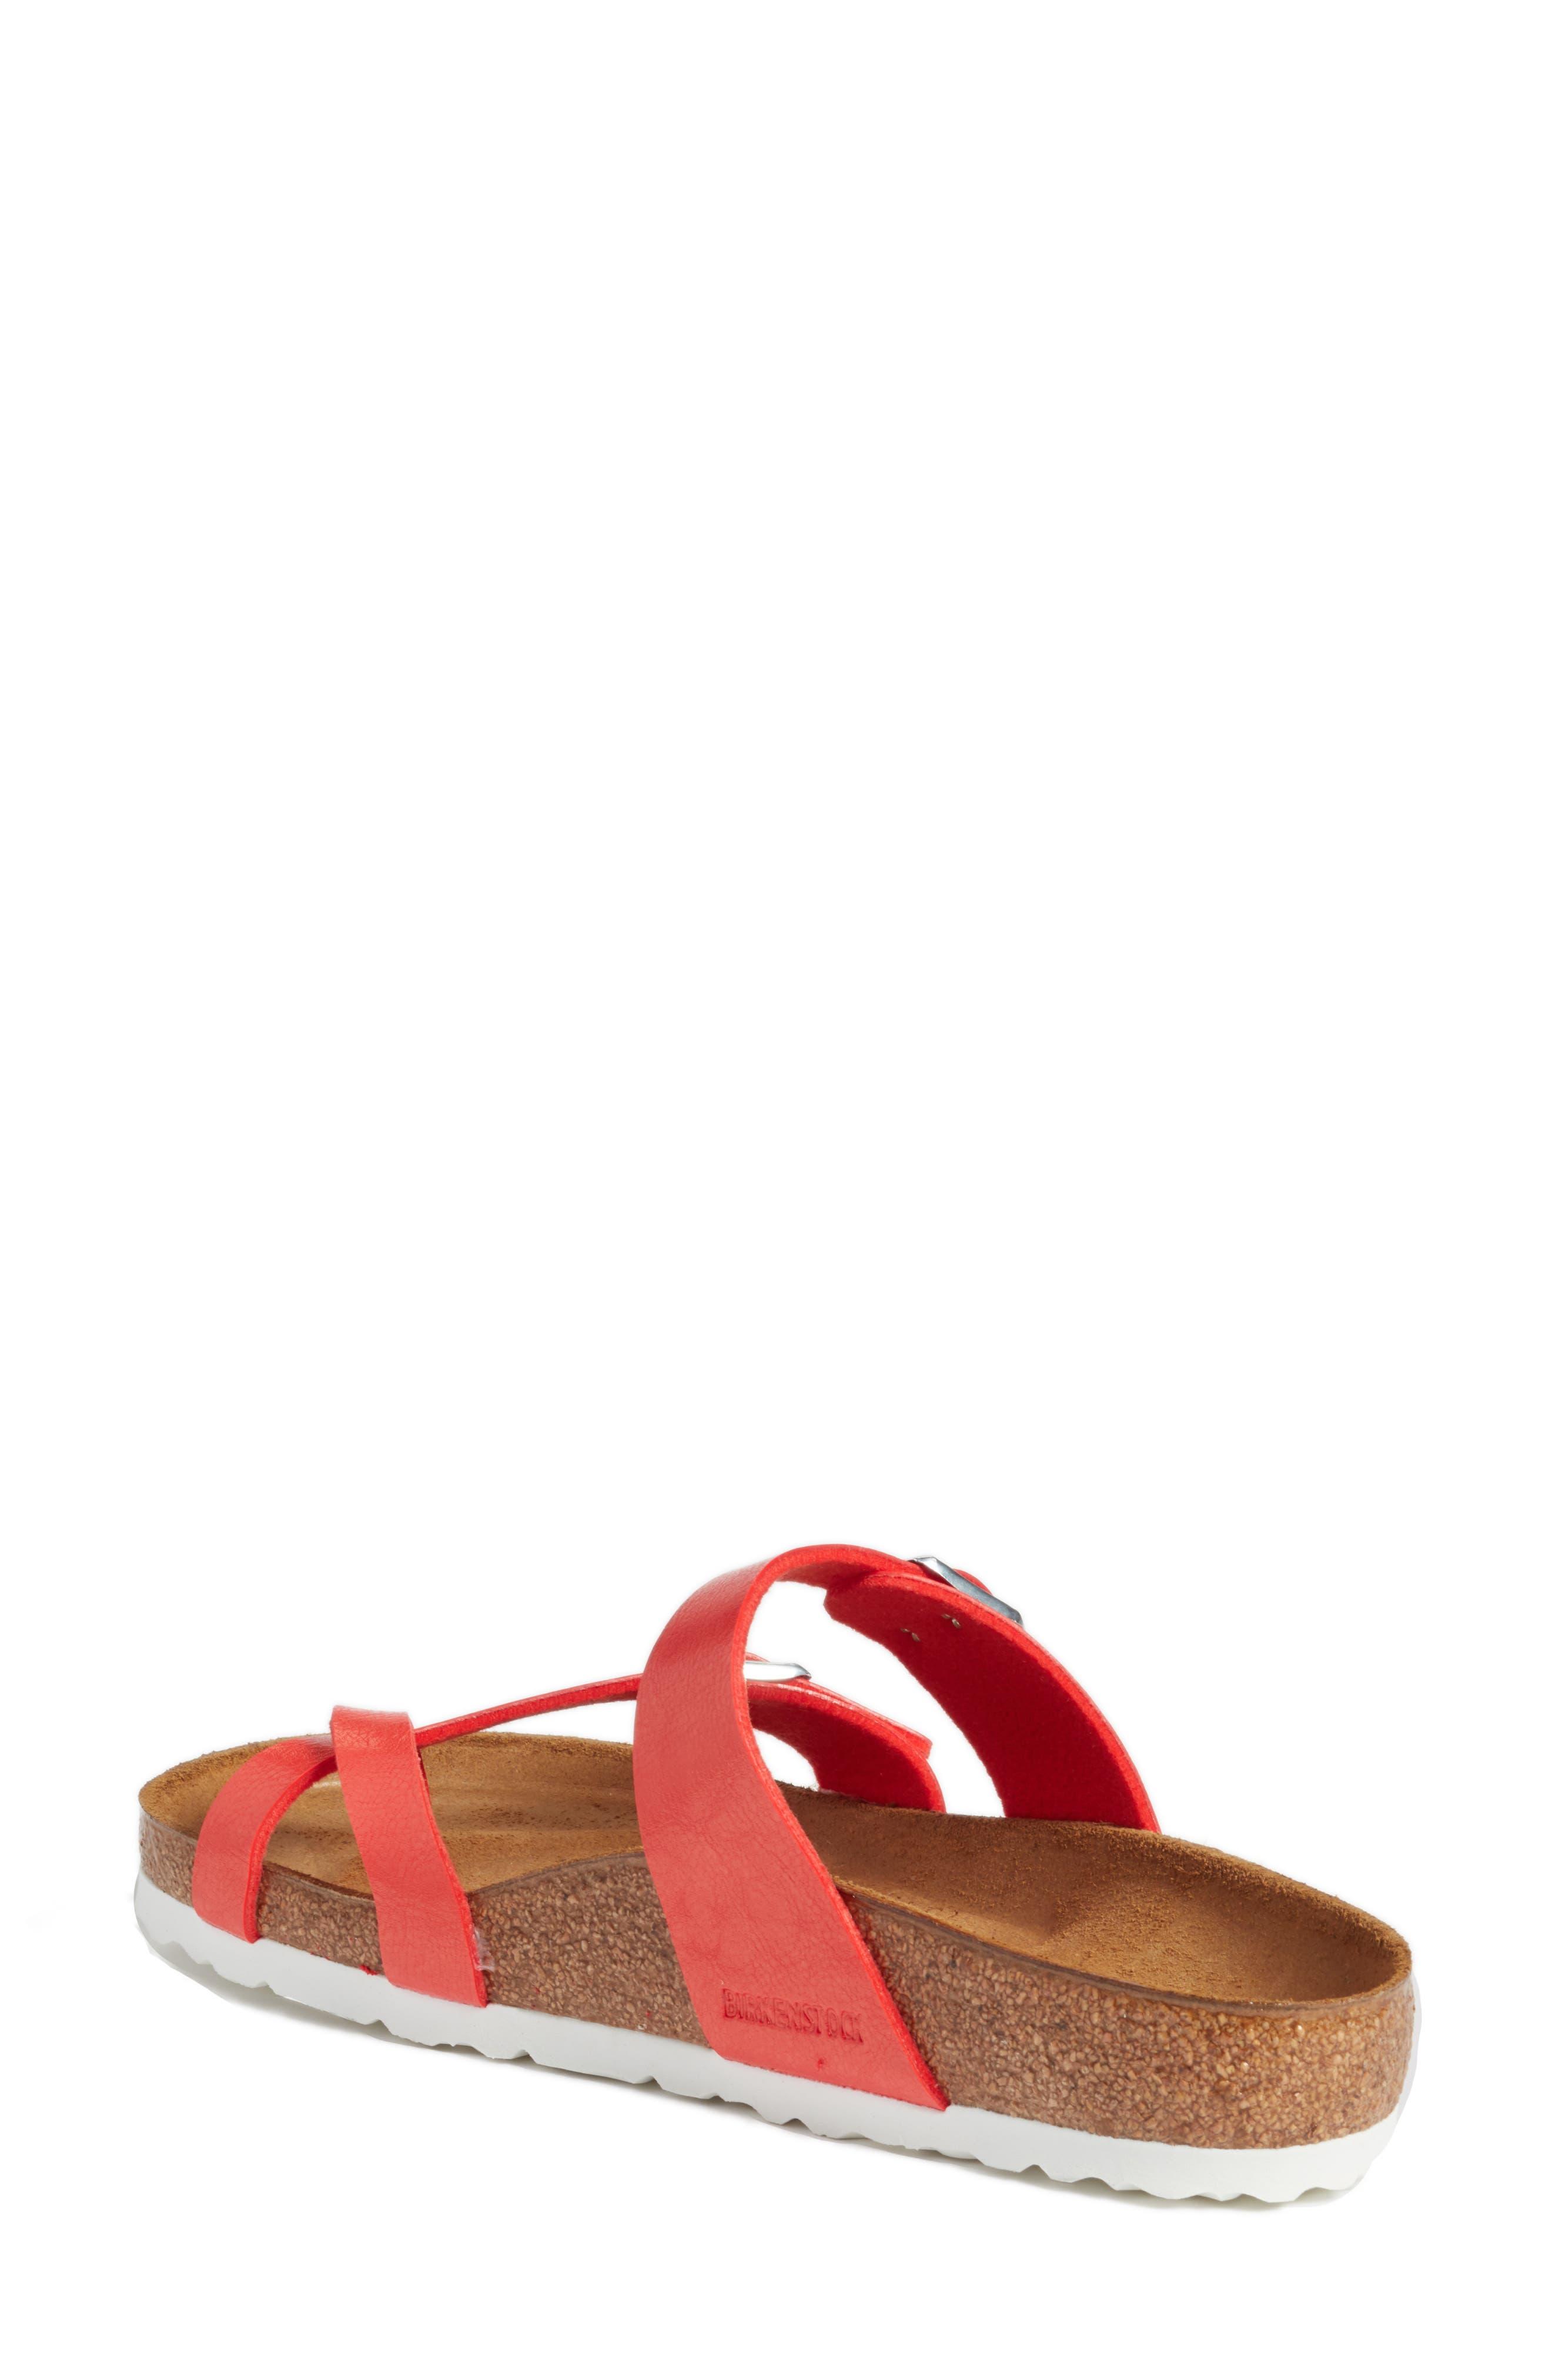 'Mayari' Birko-Flor<sup>™</sup> Sandal,                             Alternate thumbnail 2, color,                             Graceful Hibiscus Leather